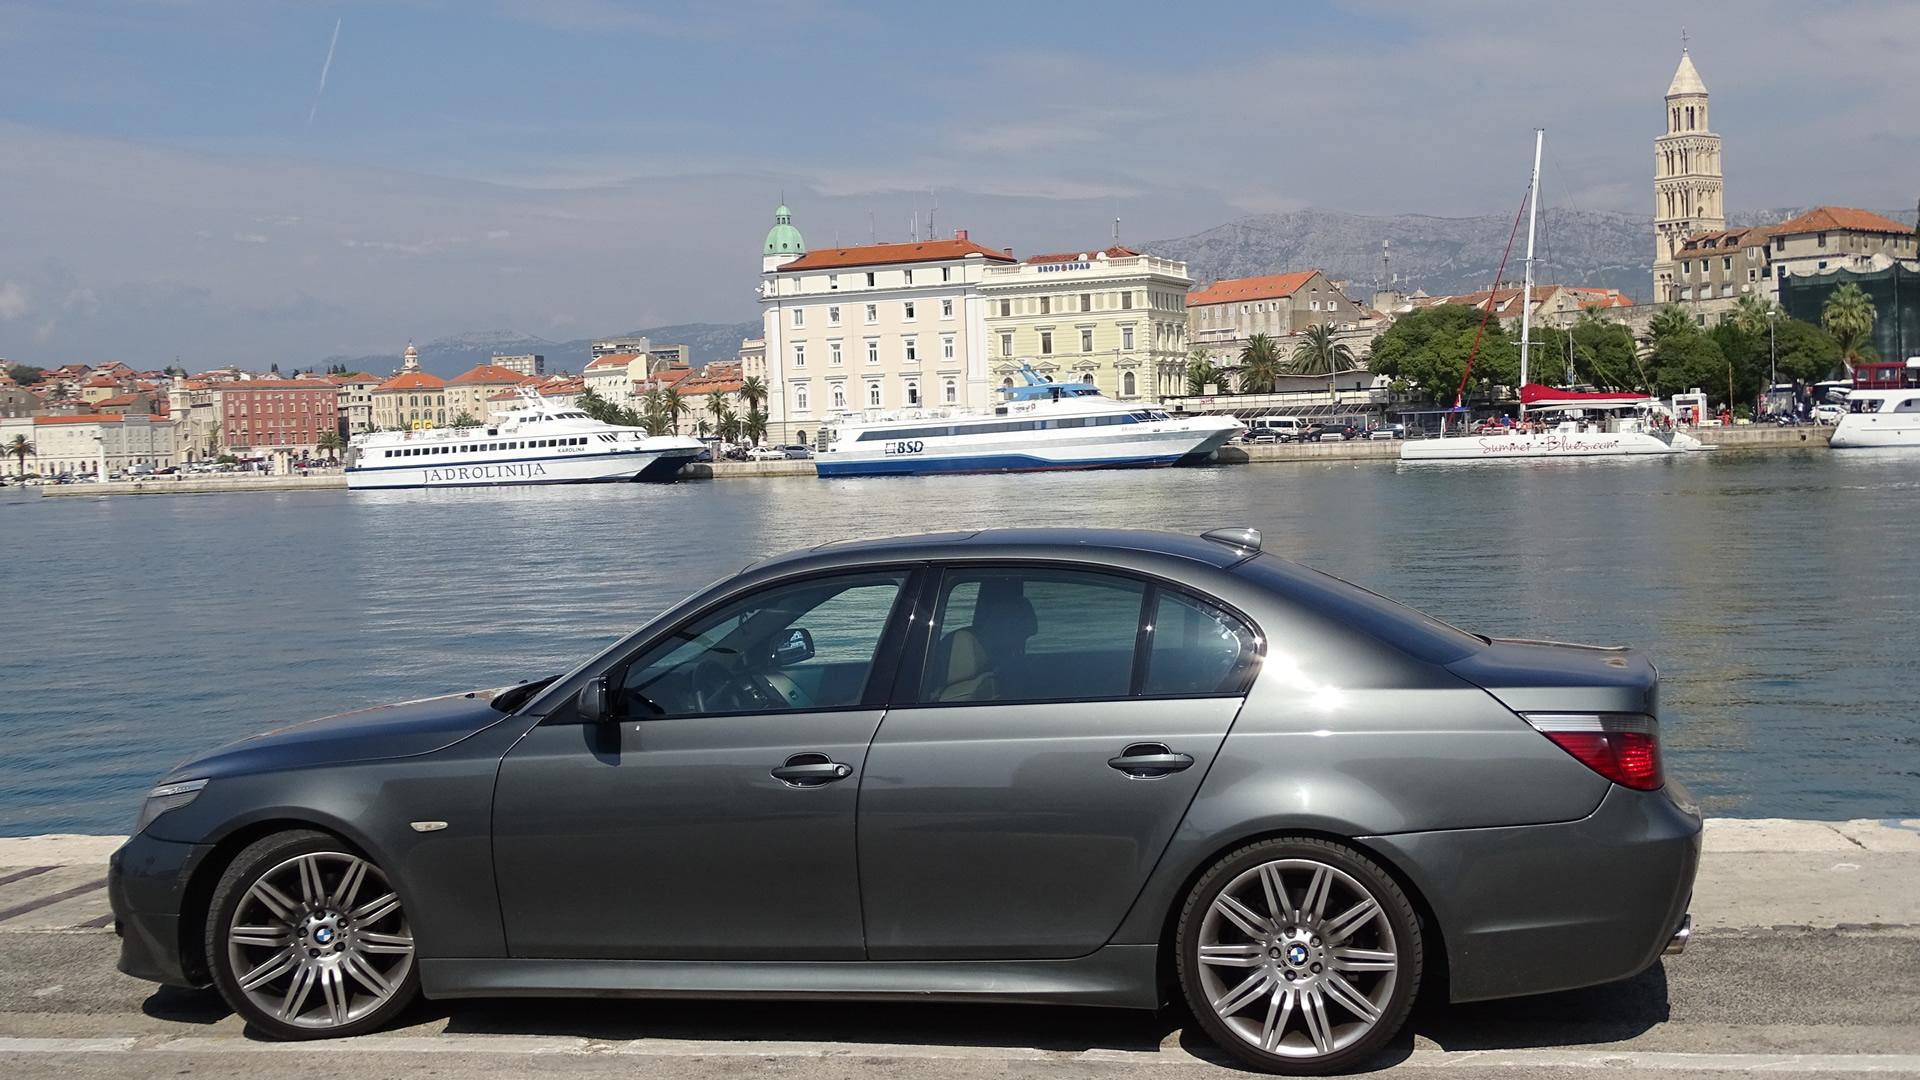 Split port car